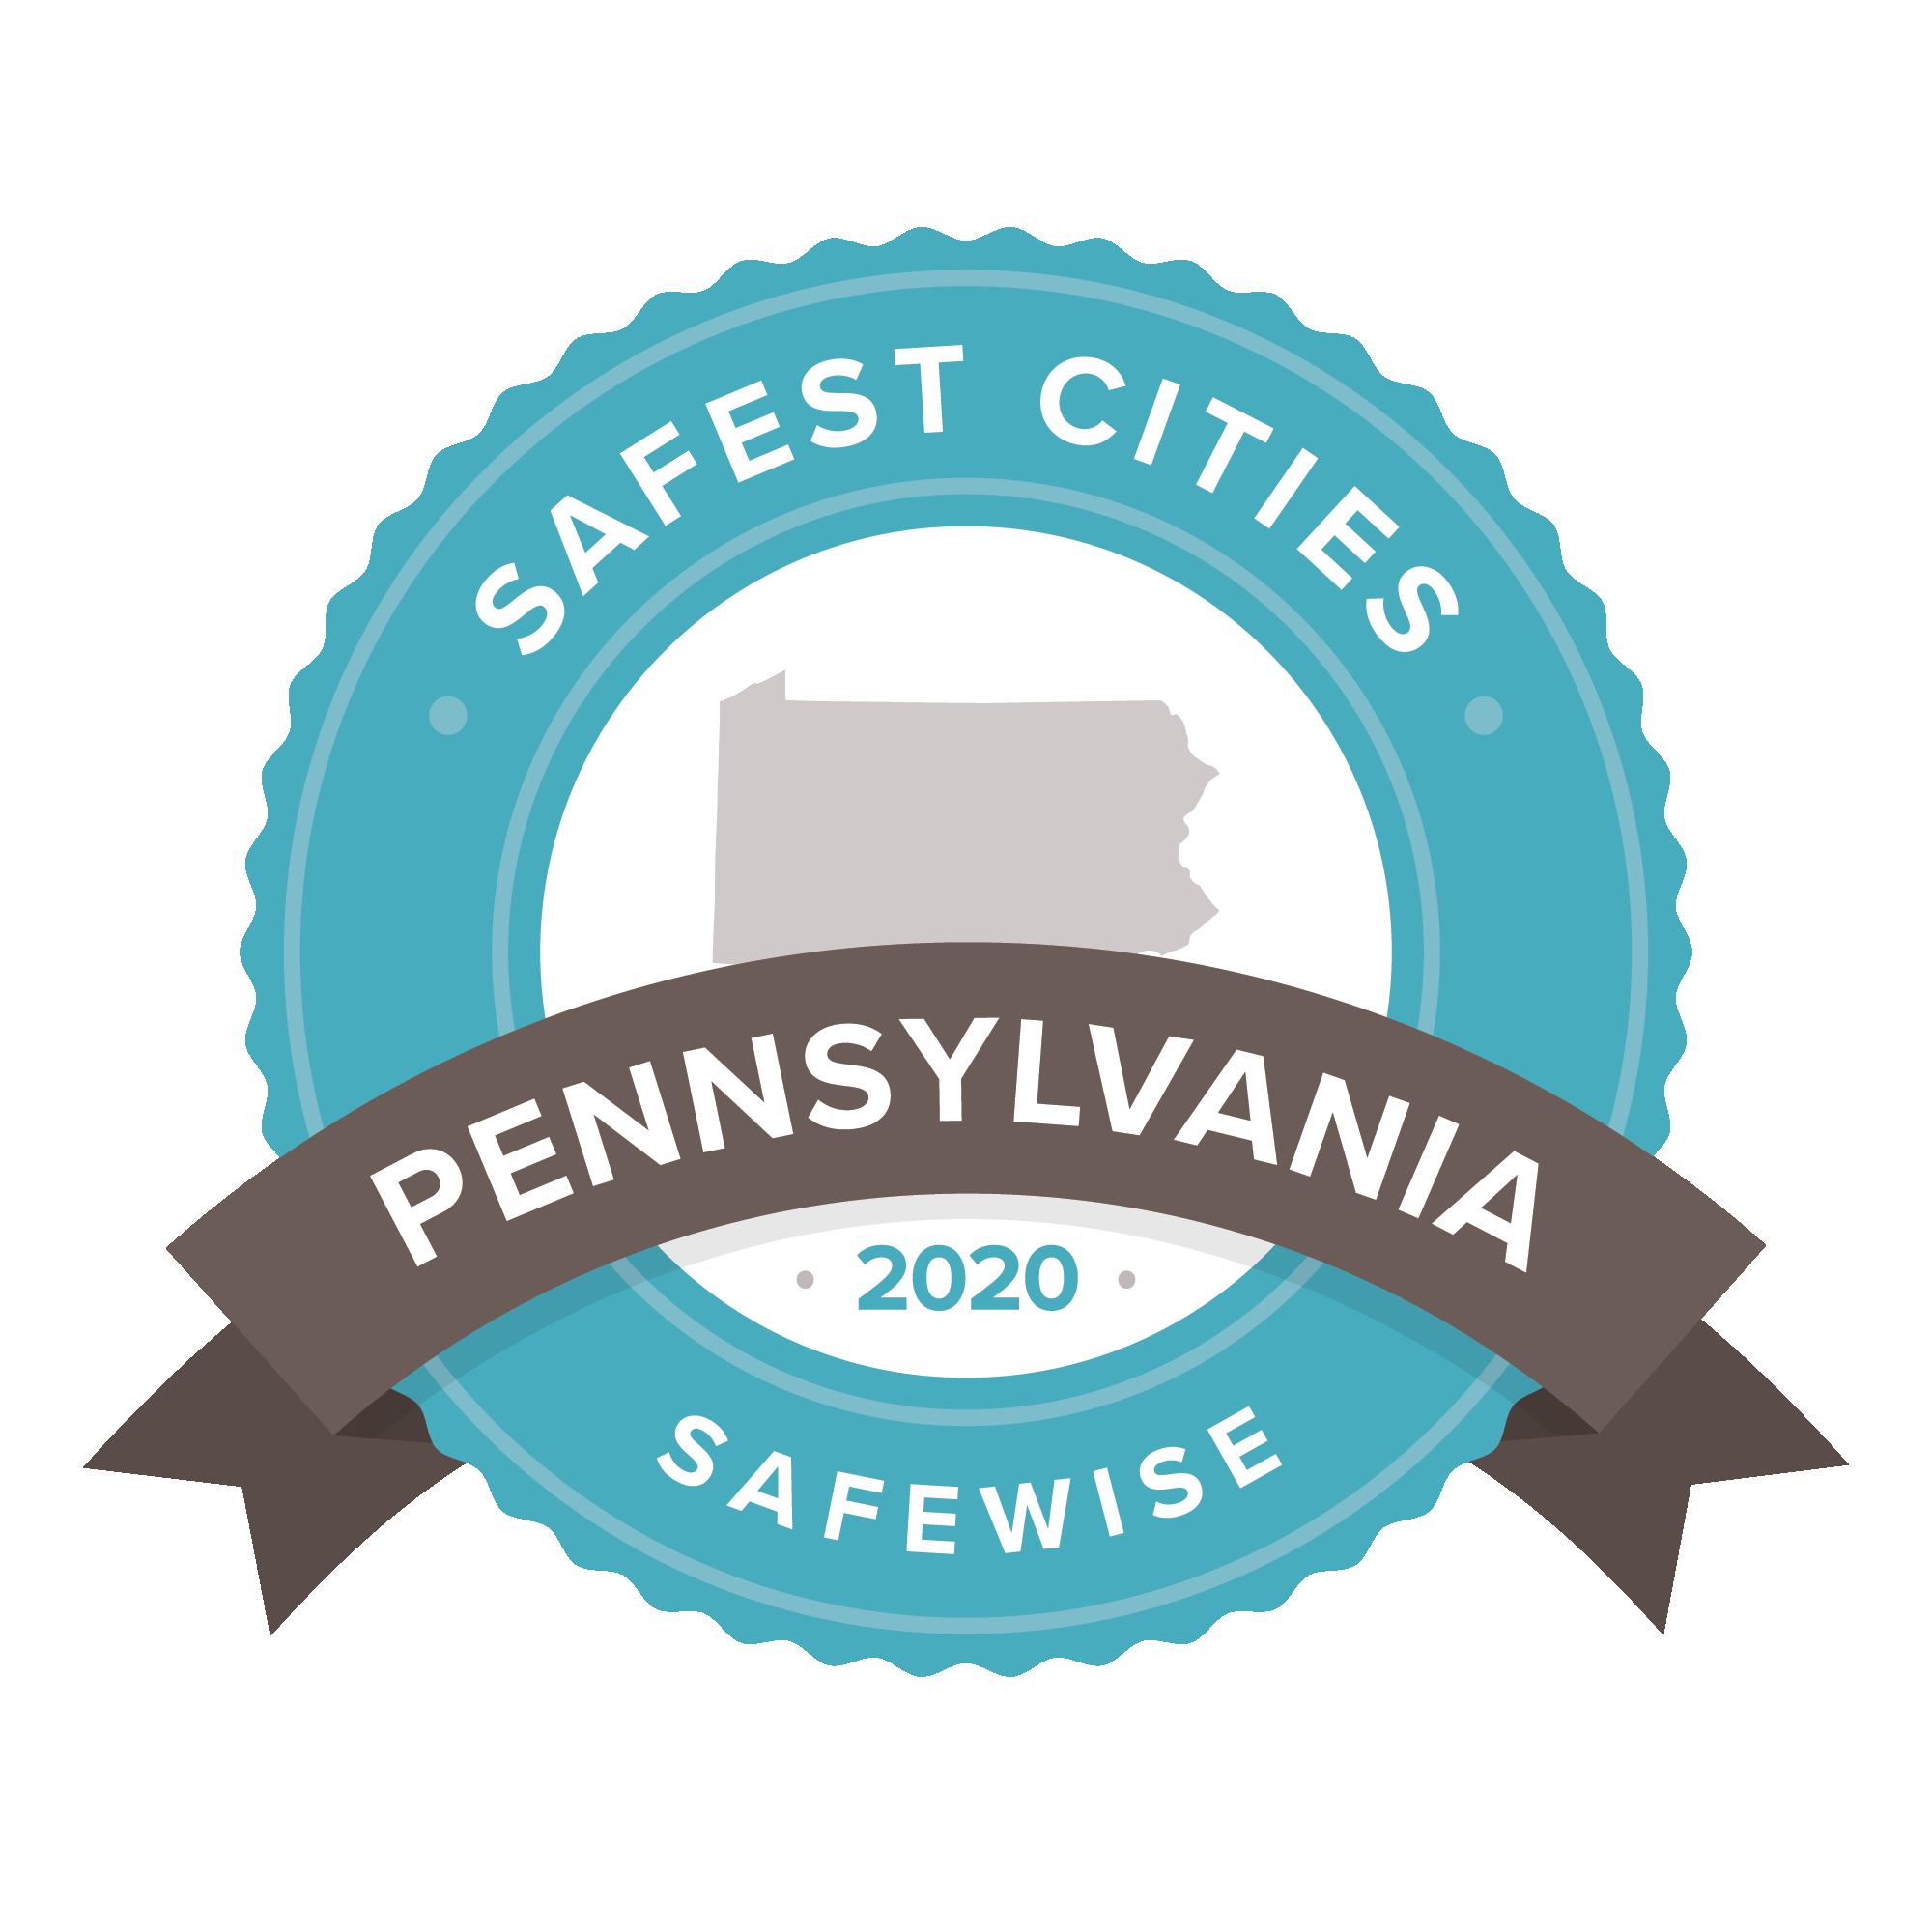 Safest Cities Pennsylvania badge